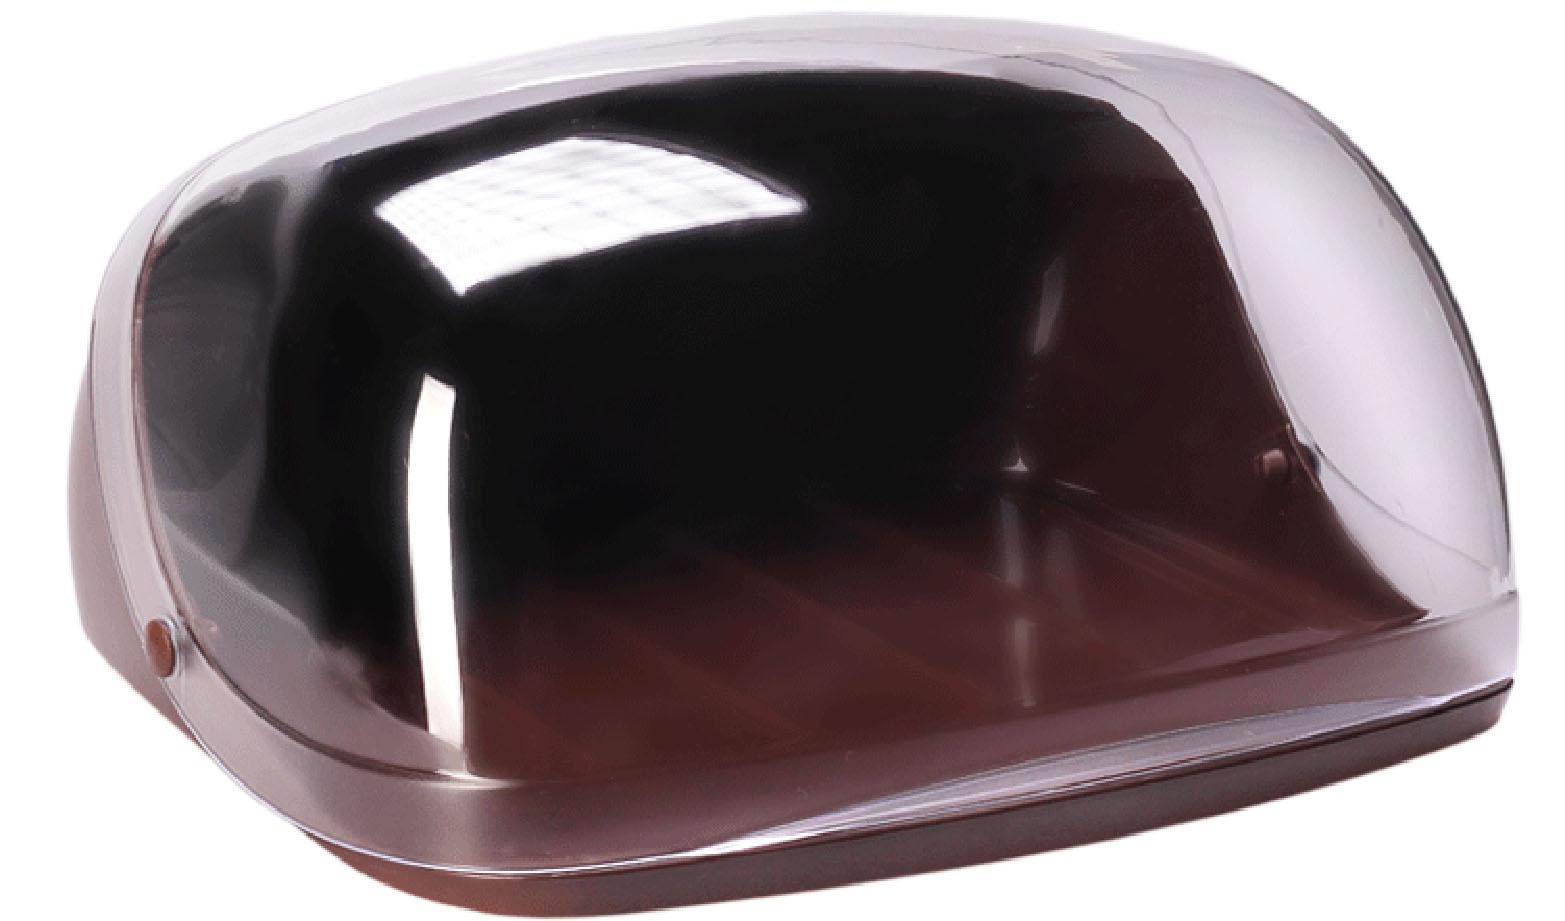 "Idea (М-пластика) Хлебница Idea ""Кристалл"", цвет: коричневый, прозрачный, 40 х 29 х 16 см М 1181"